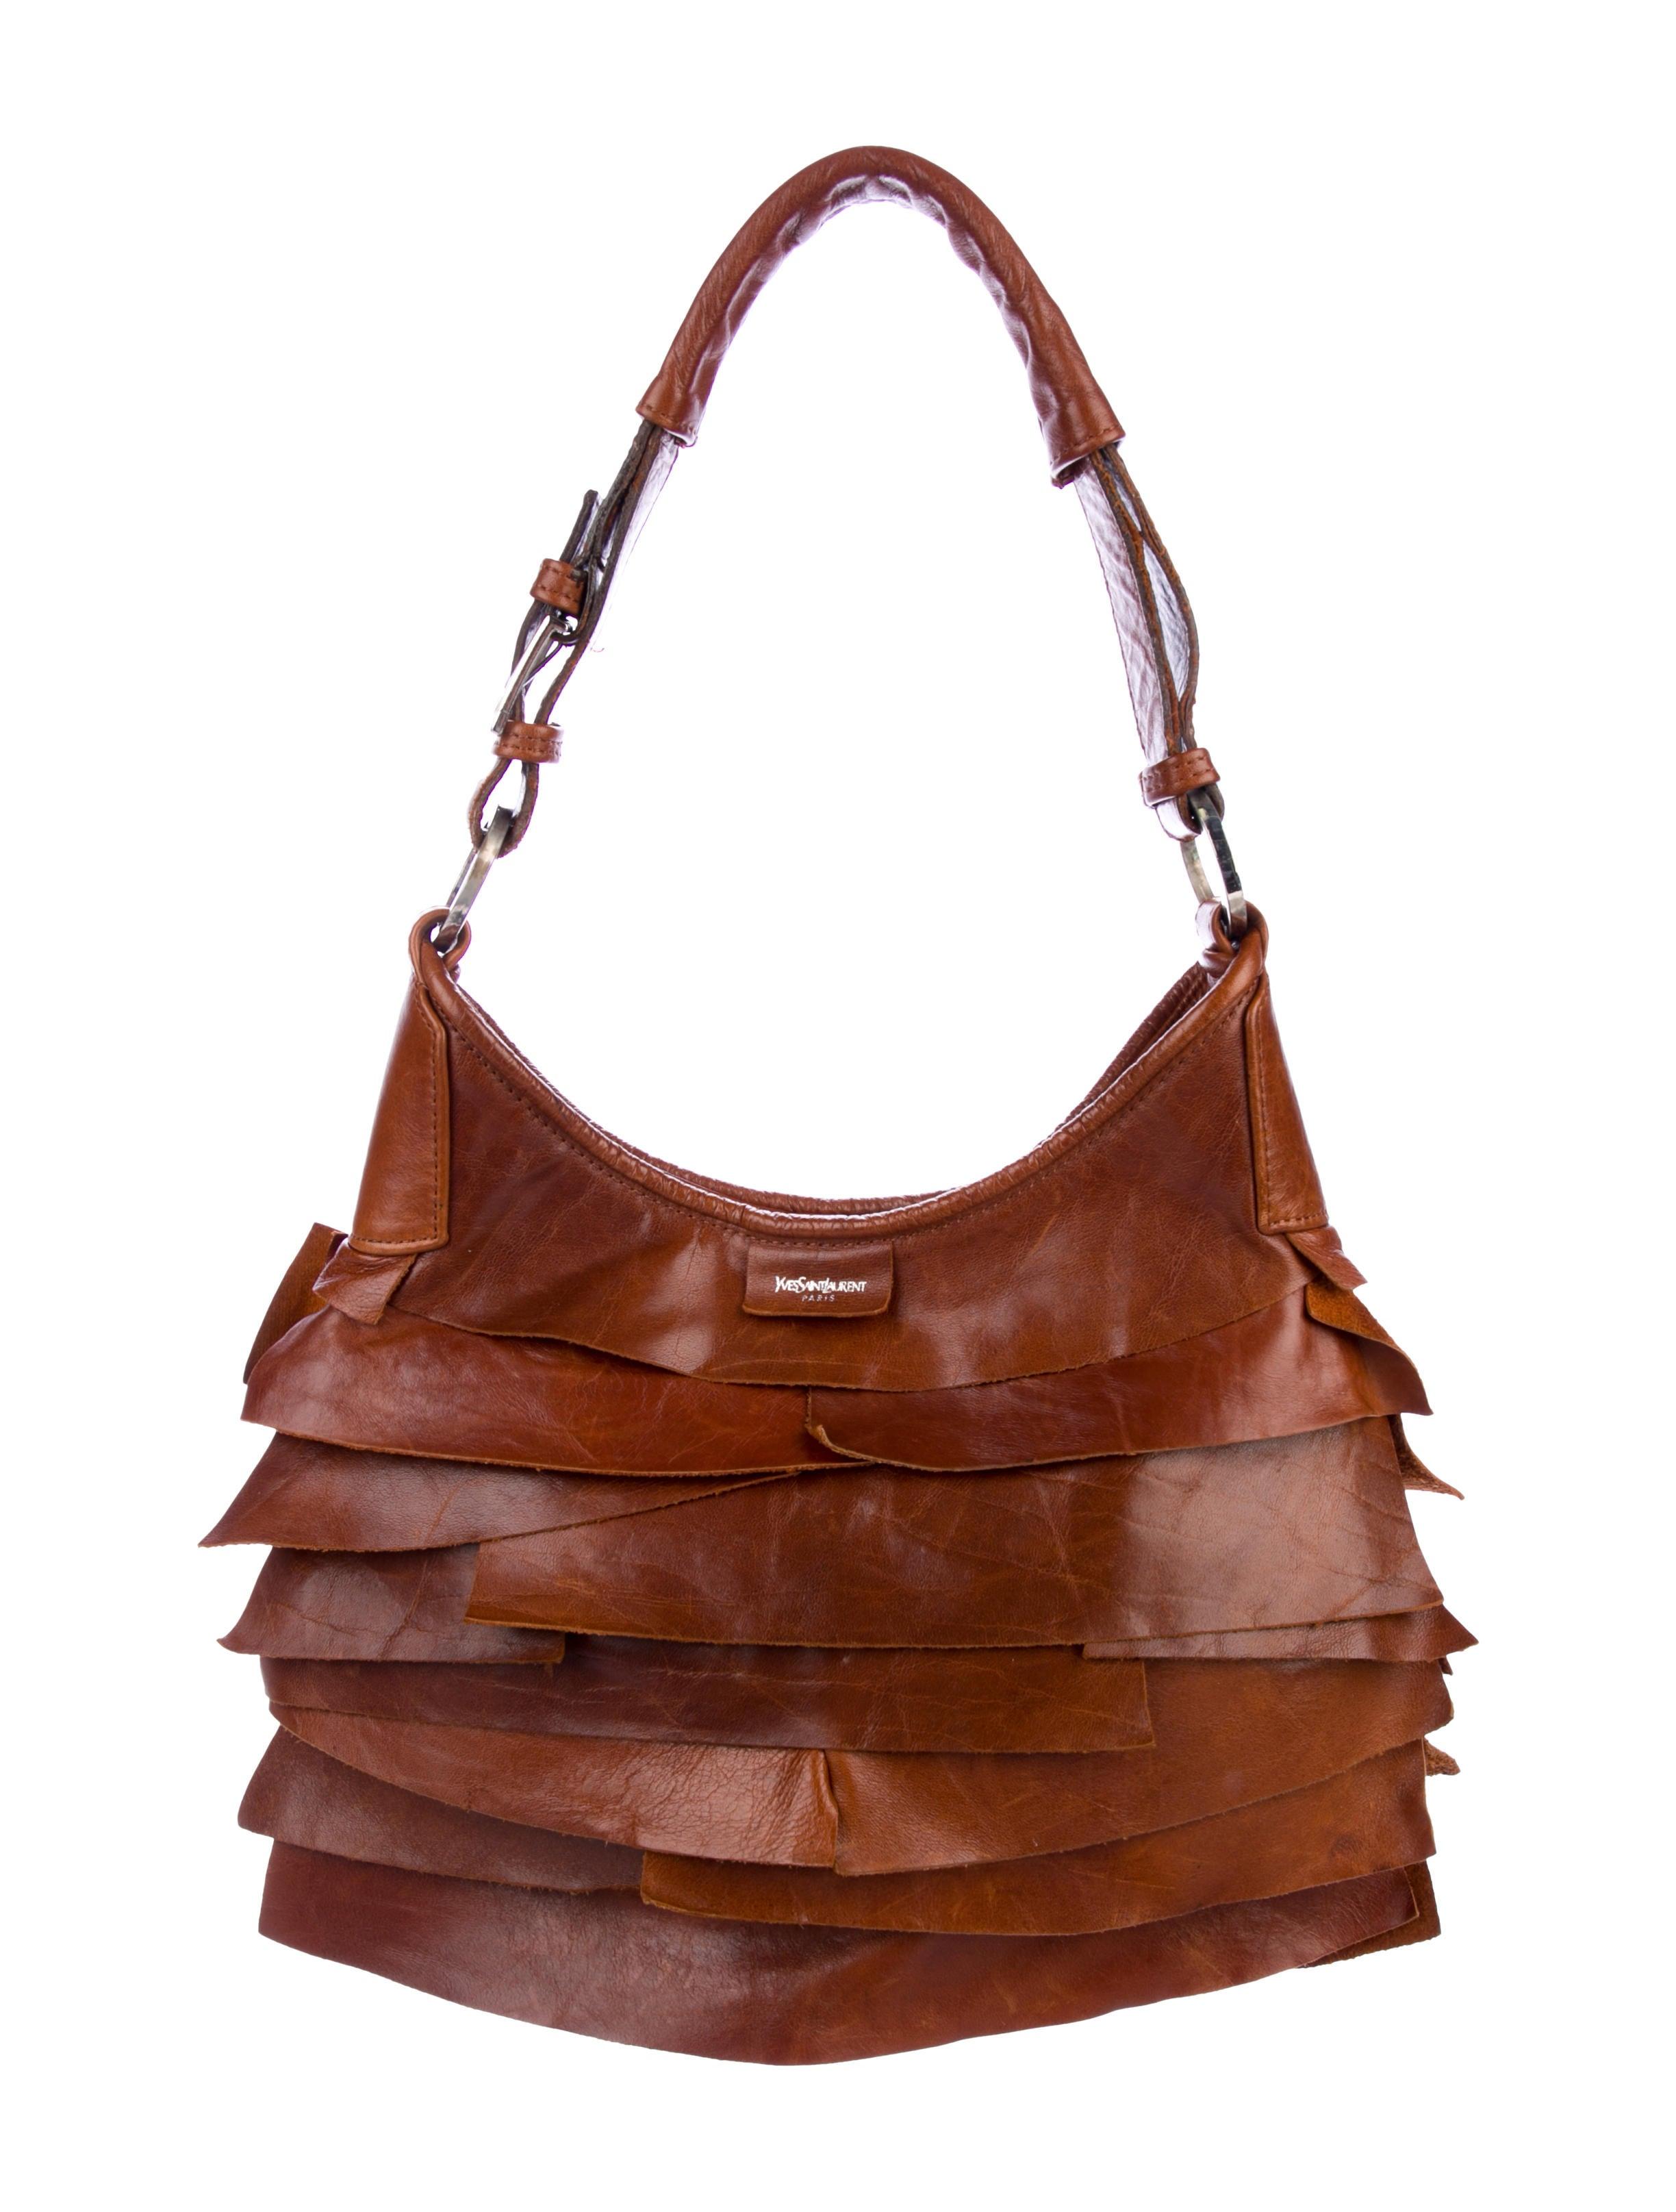 6ca0c6300b4d9 Yves Saint Laurent St. Tropez Bag - Handbags - YVE86451